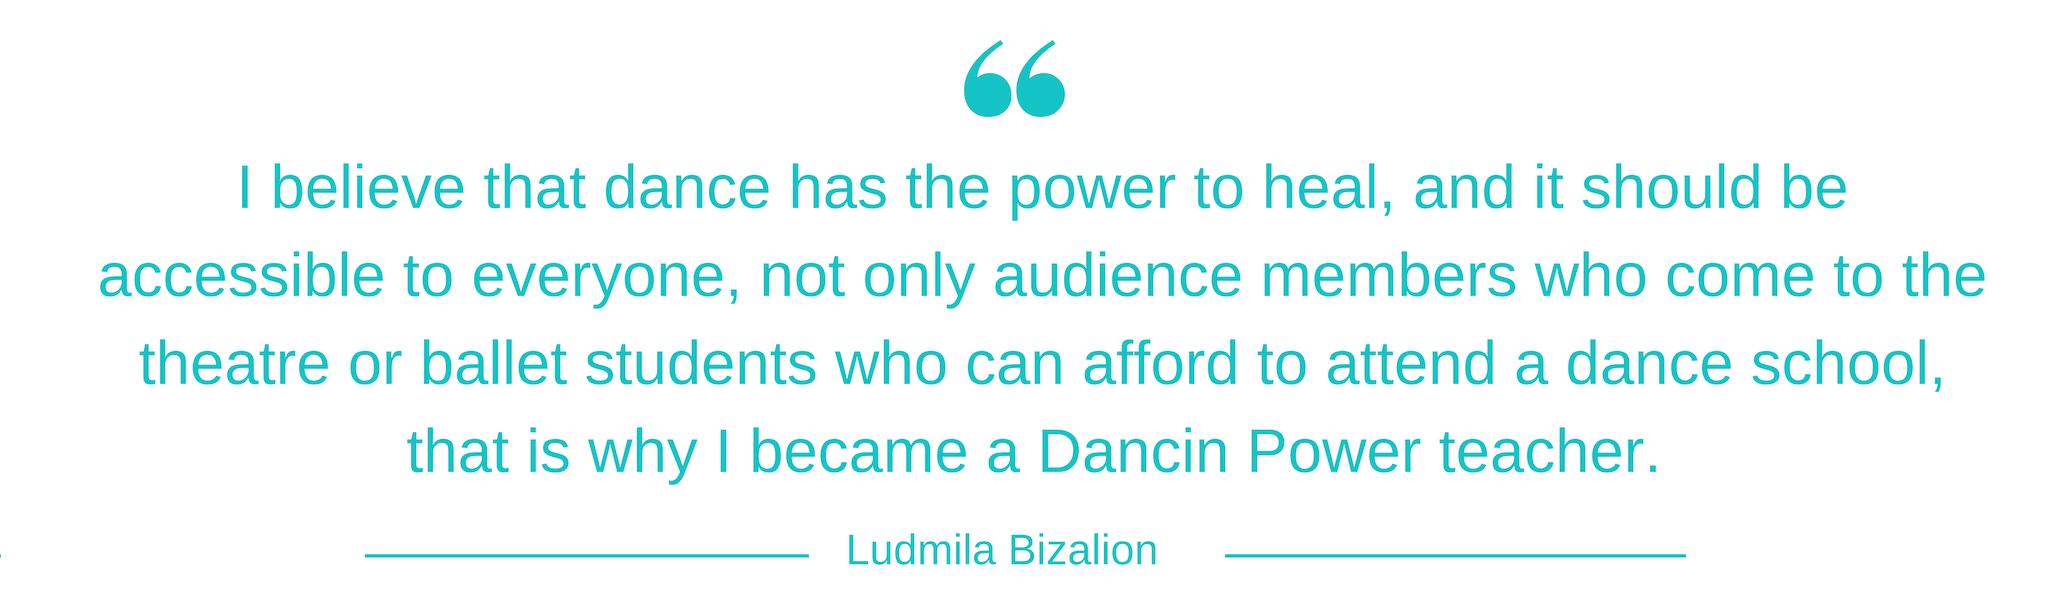 Teachers - Dancin Power